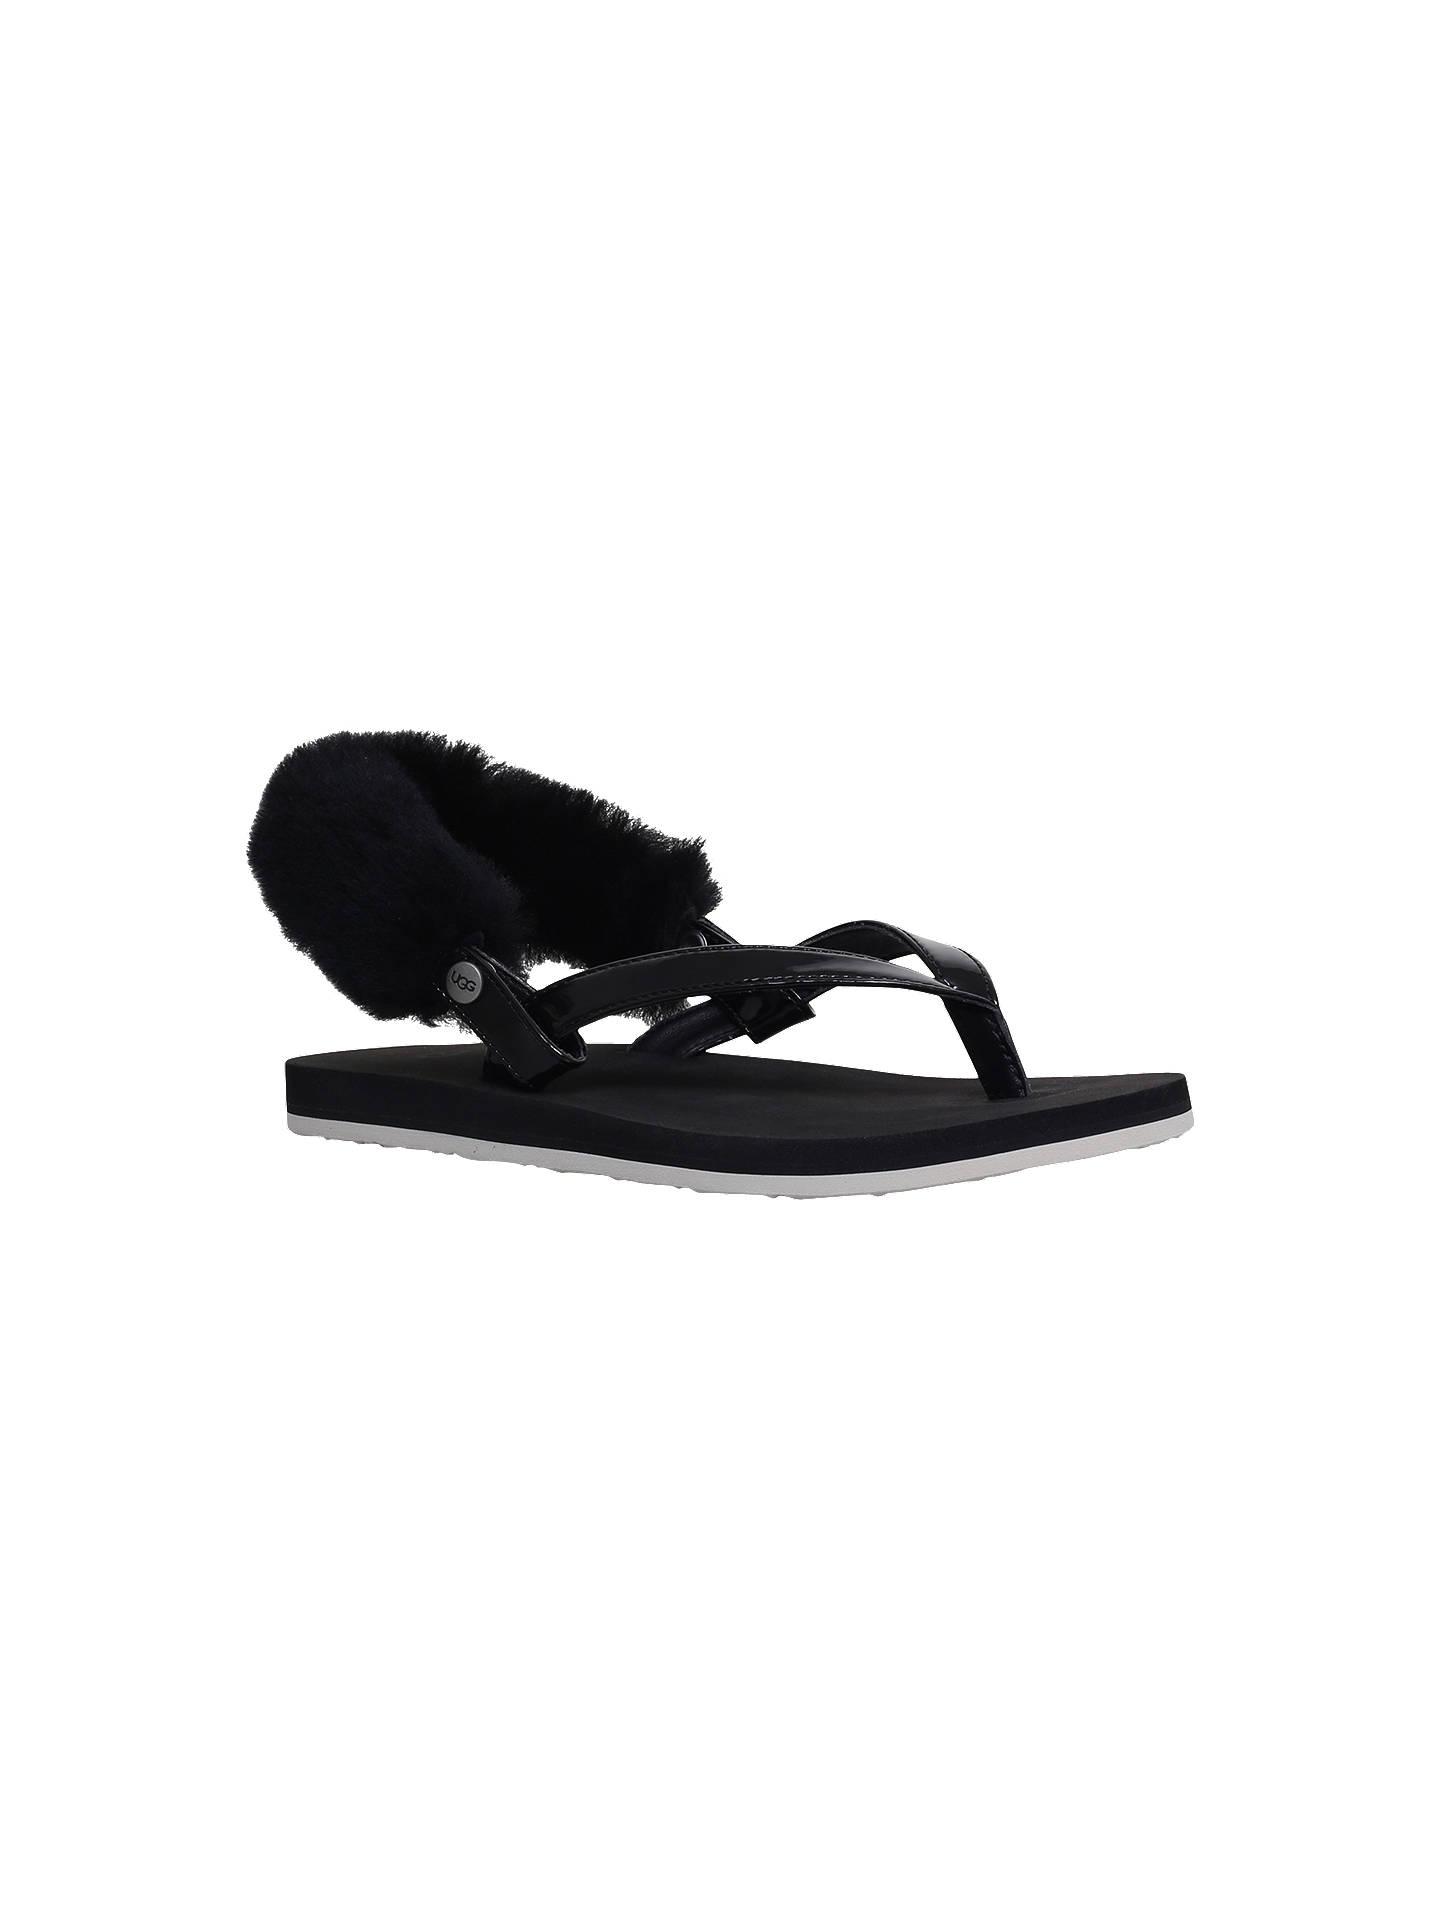 4ac8fec1539 UGG Laalaa Toe Post Sandals at John Lewis & Partners